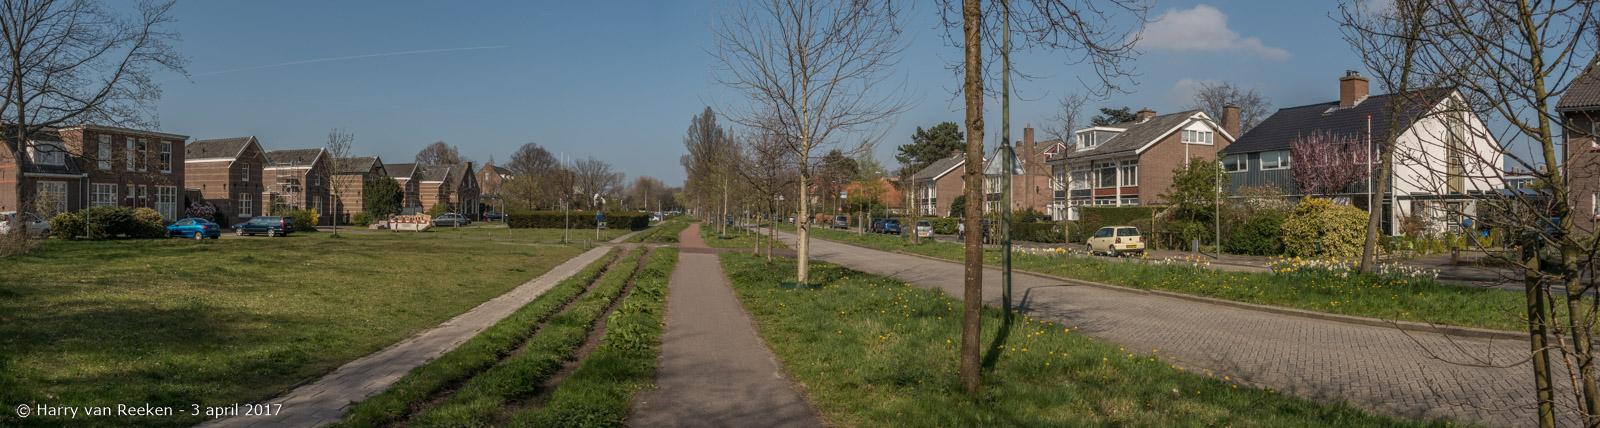 Pompstationsweg-8-Pano